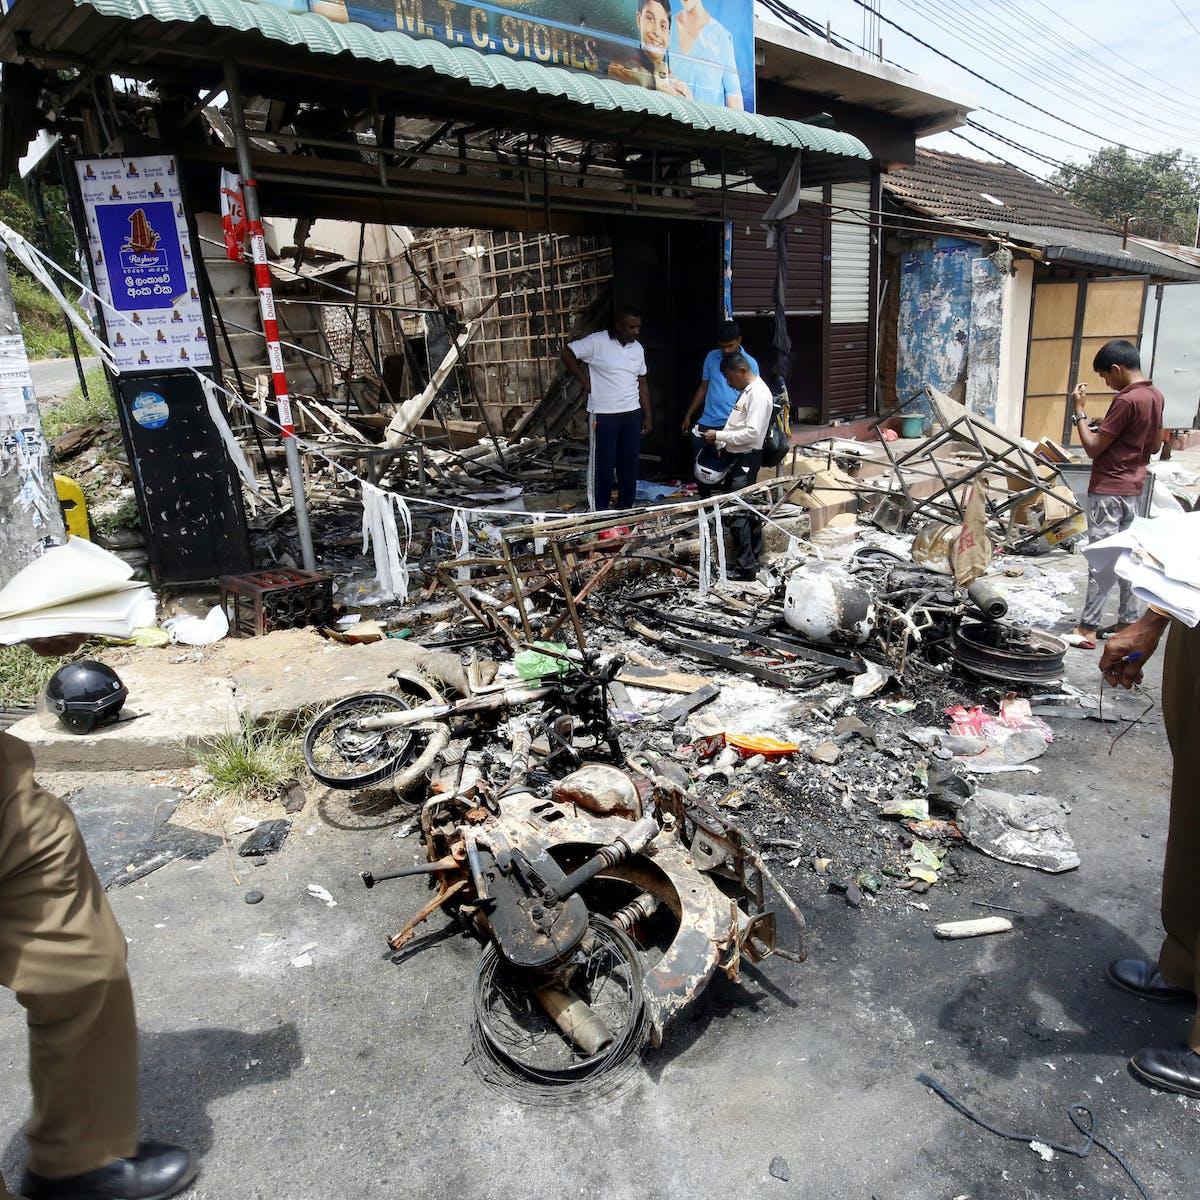 Violent Buddhist extremists are targeting Muslims in Sri Lanka